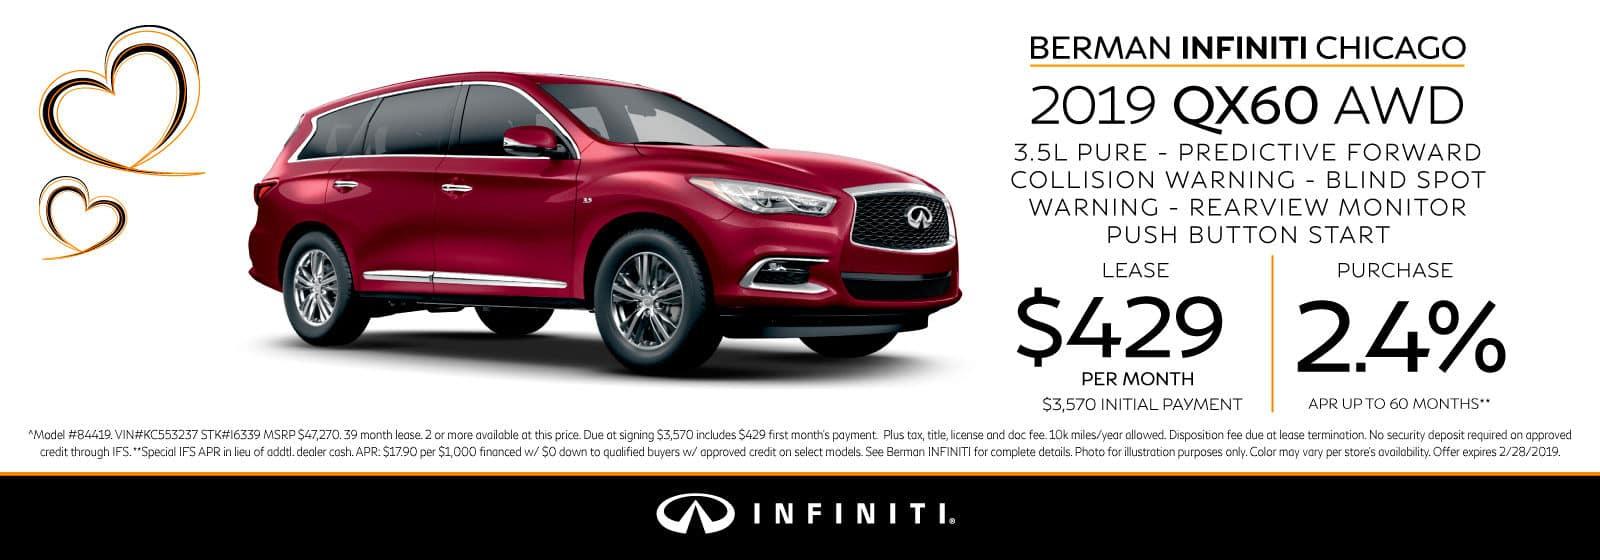 New 2019 INFINITI QX60 February offer at Berman INFINITI Chicago!